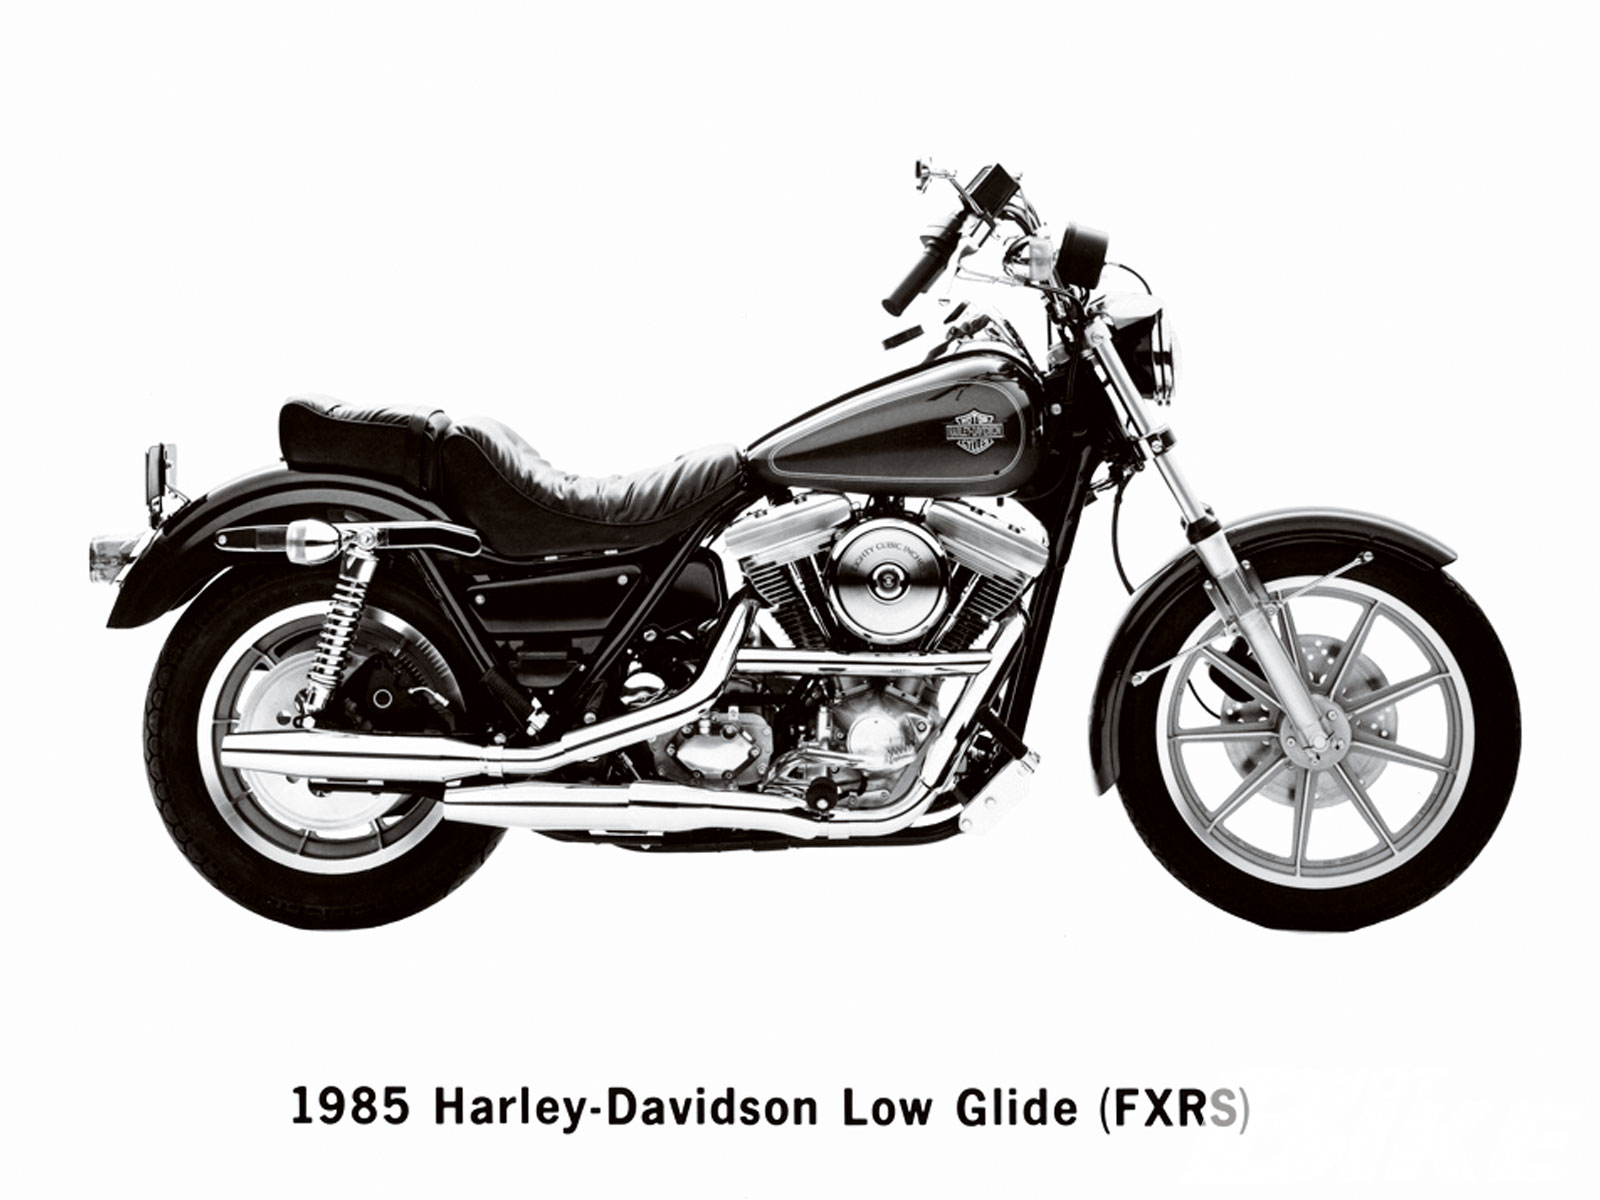 1984 harley davidson fxr wiring diagram 1984 fxrs frame wiring diagram elsalvadorla 1990 harley softail wiring [ 1600 x 1200 Pixel ]